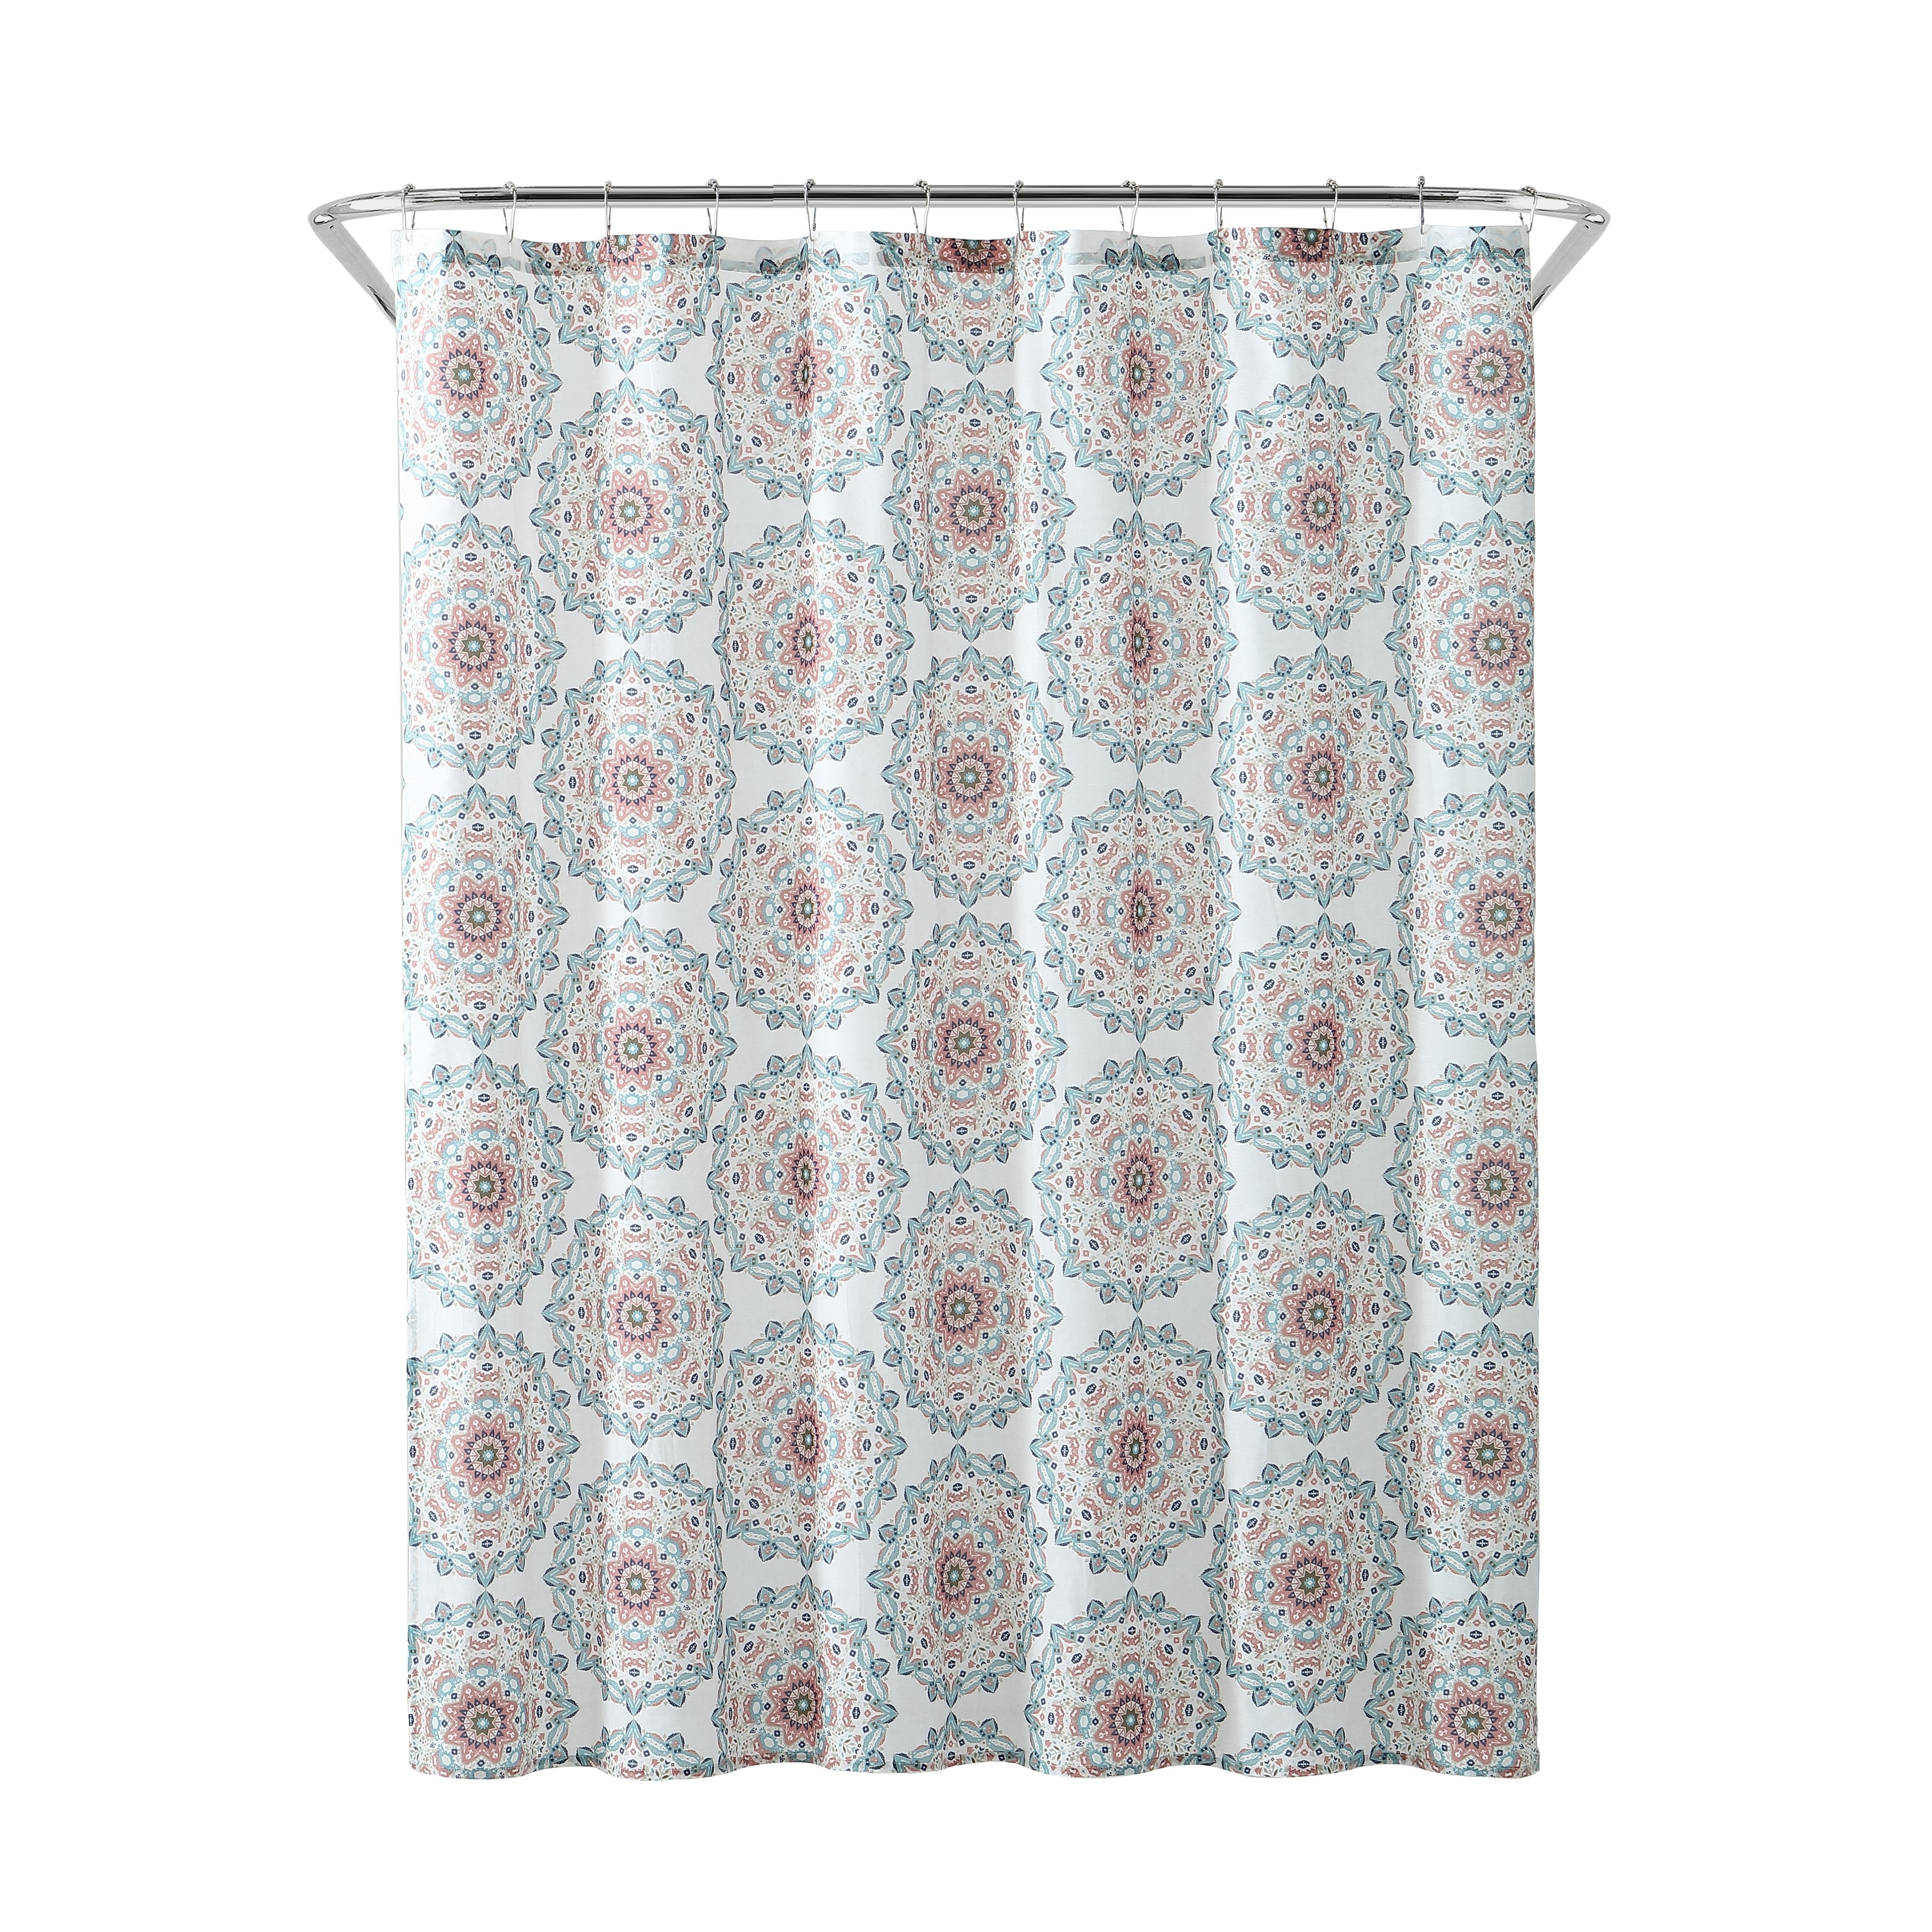 Shop Black Friday Deals On Peach Oak Tribal Medallion Shower Curtain Overstock 23477430